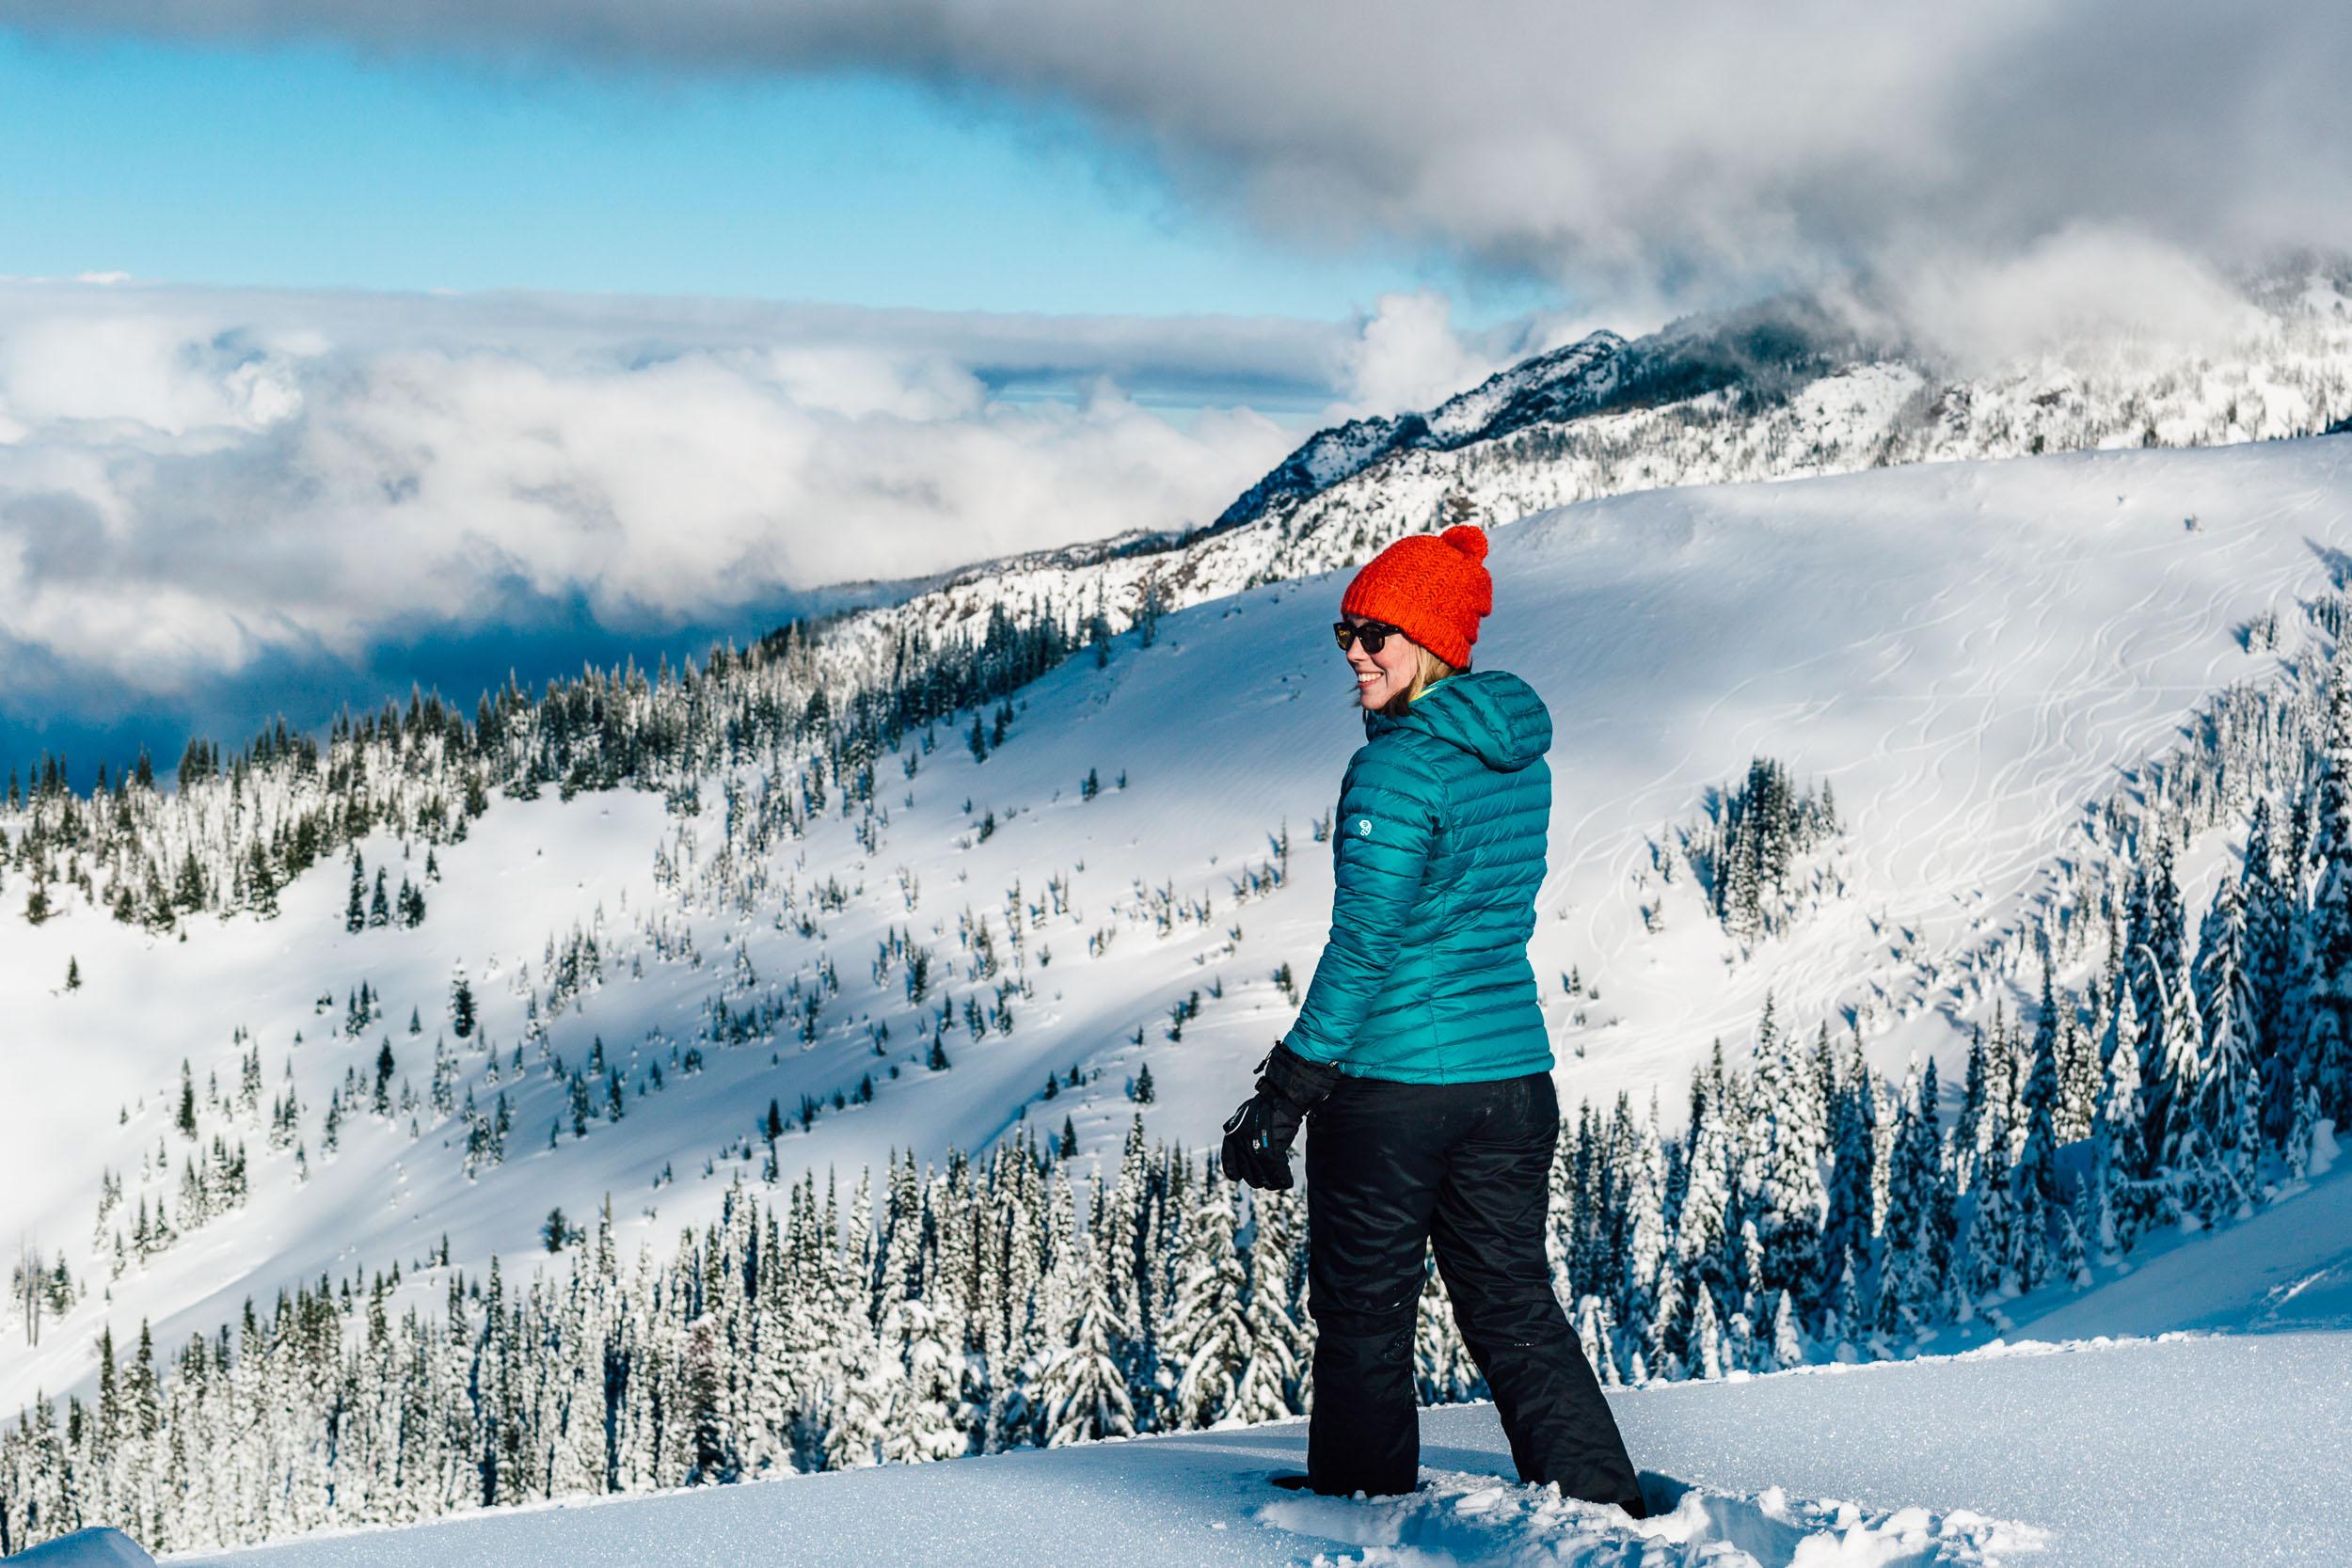 Gemma on the top of the snow covered mountain at Hurricane Ridge, Washington